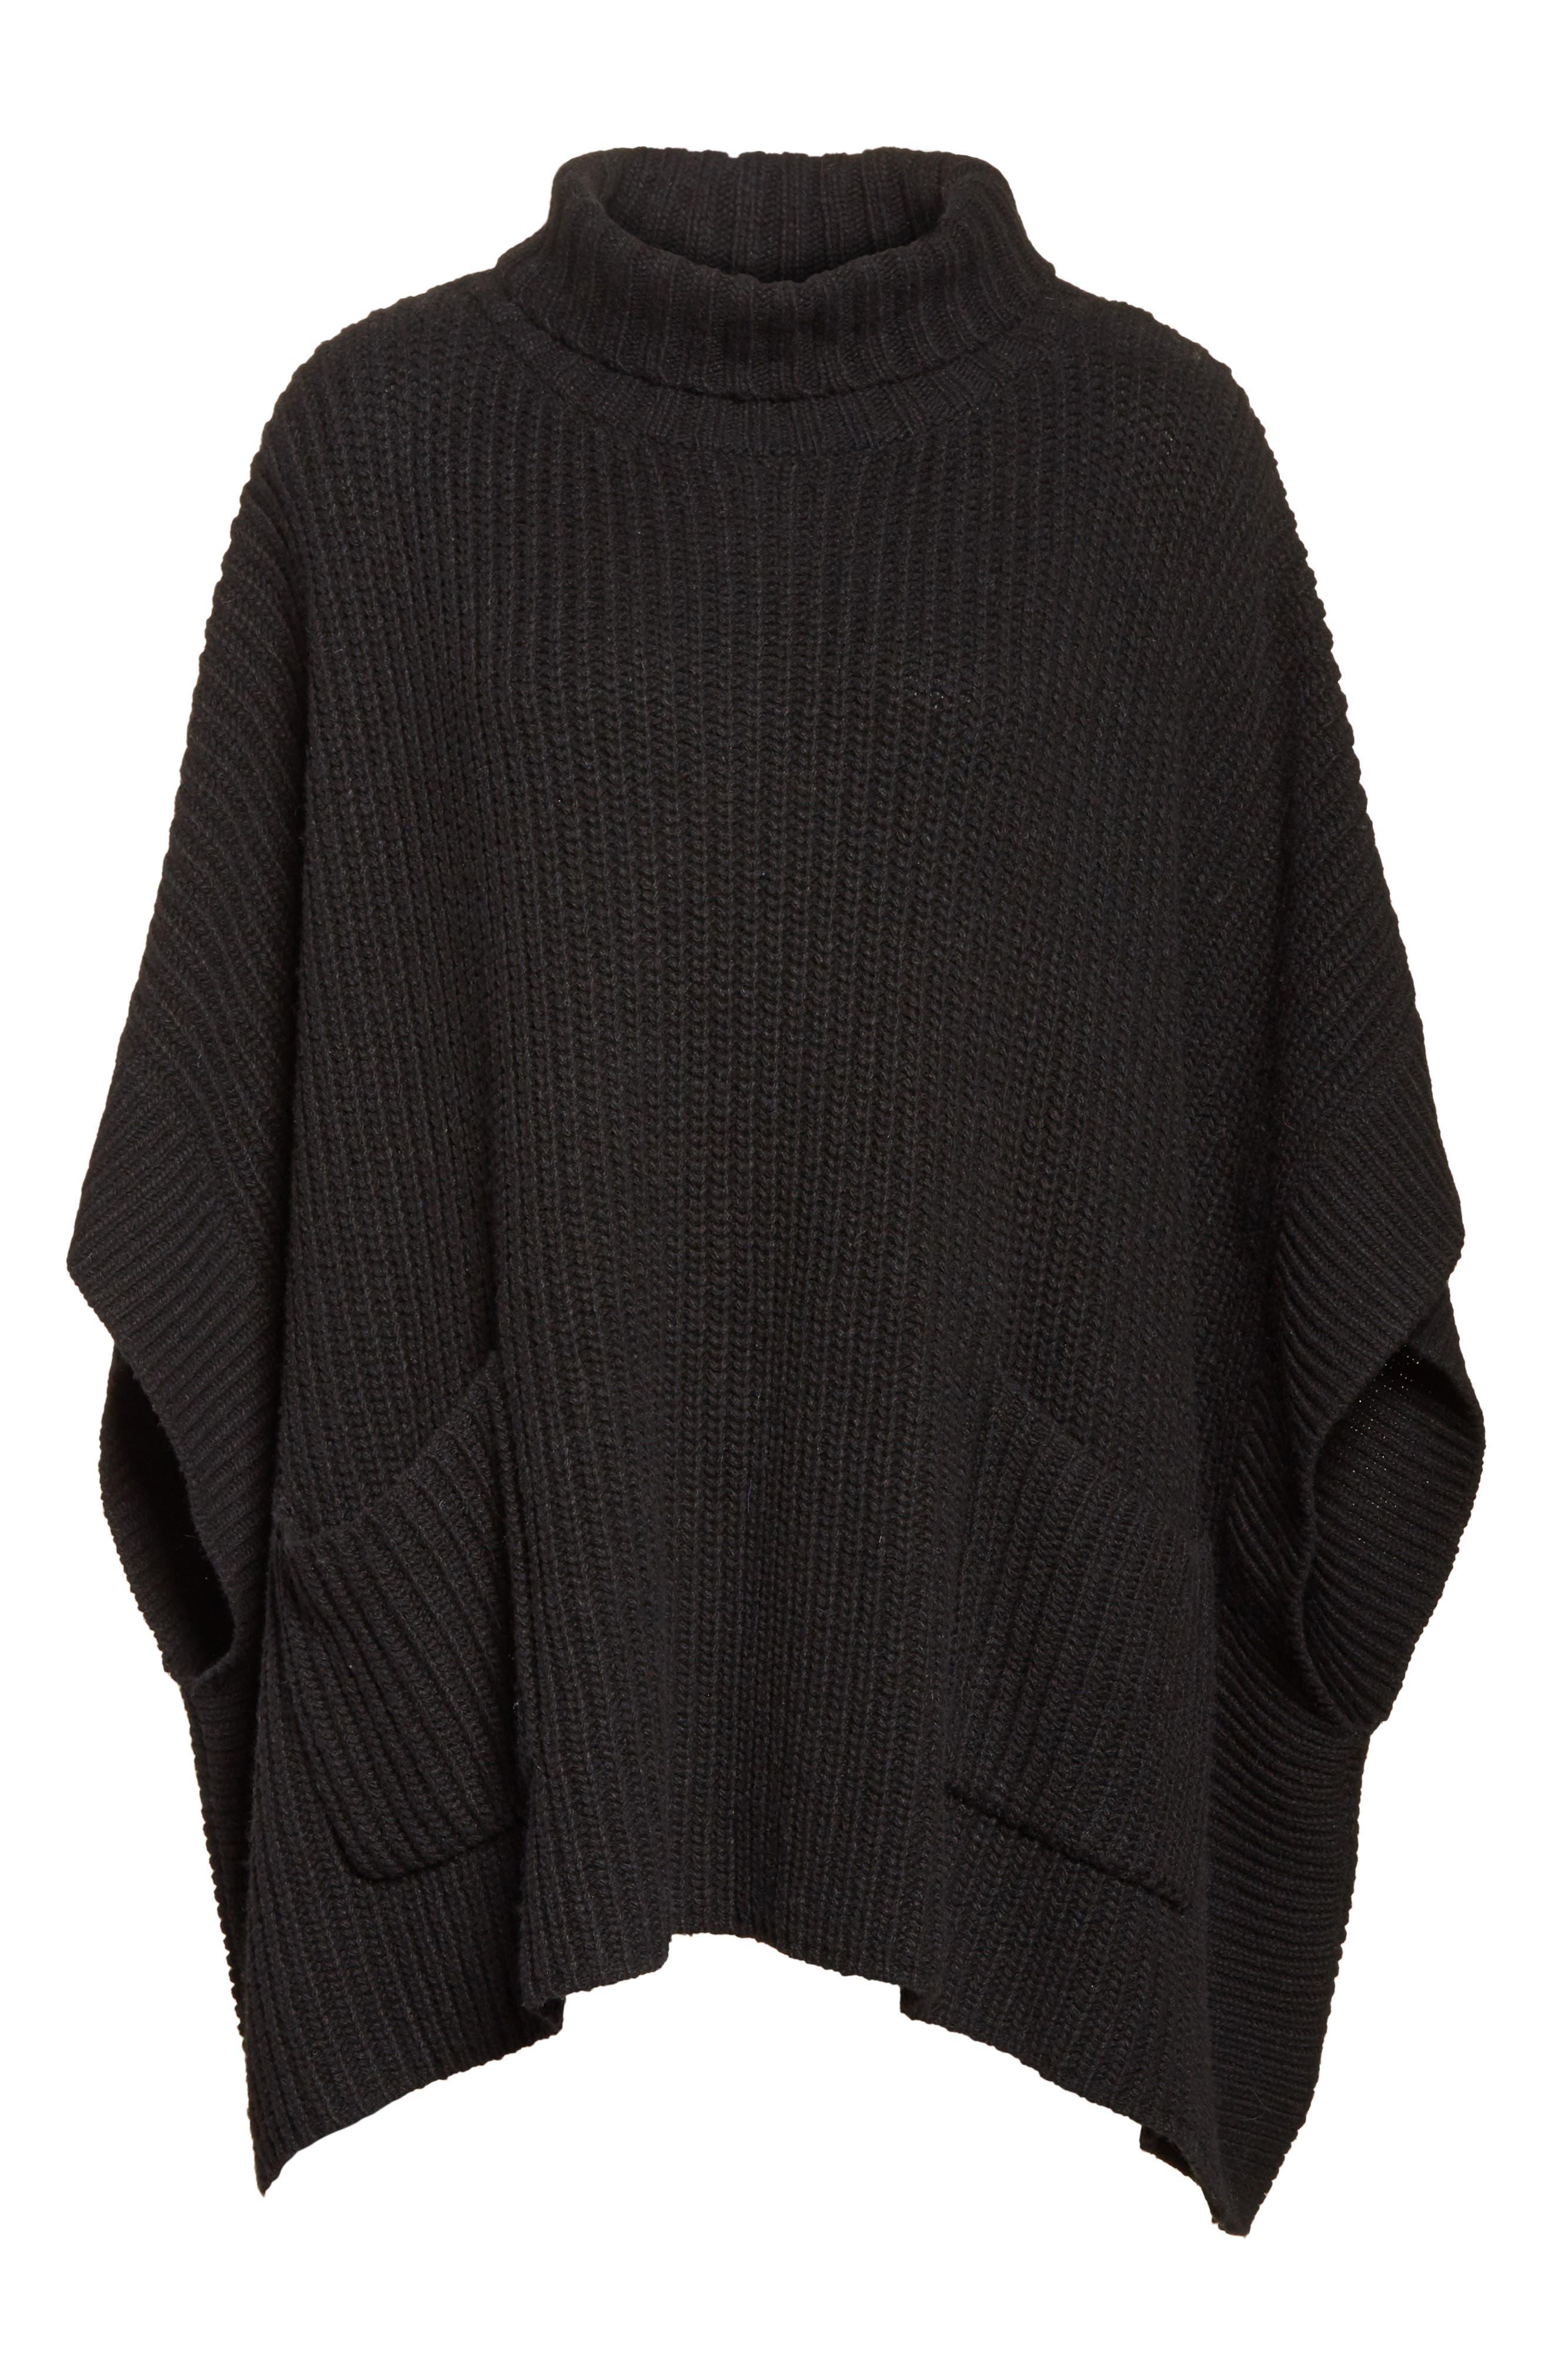 Serina Oversize Sweater,                             Alternate thumbnail 6, color,                             007